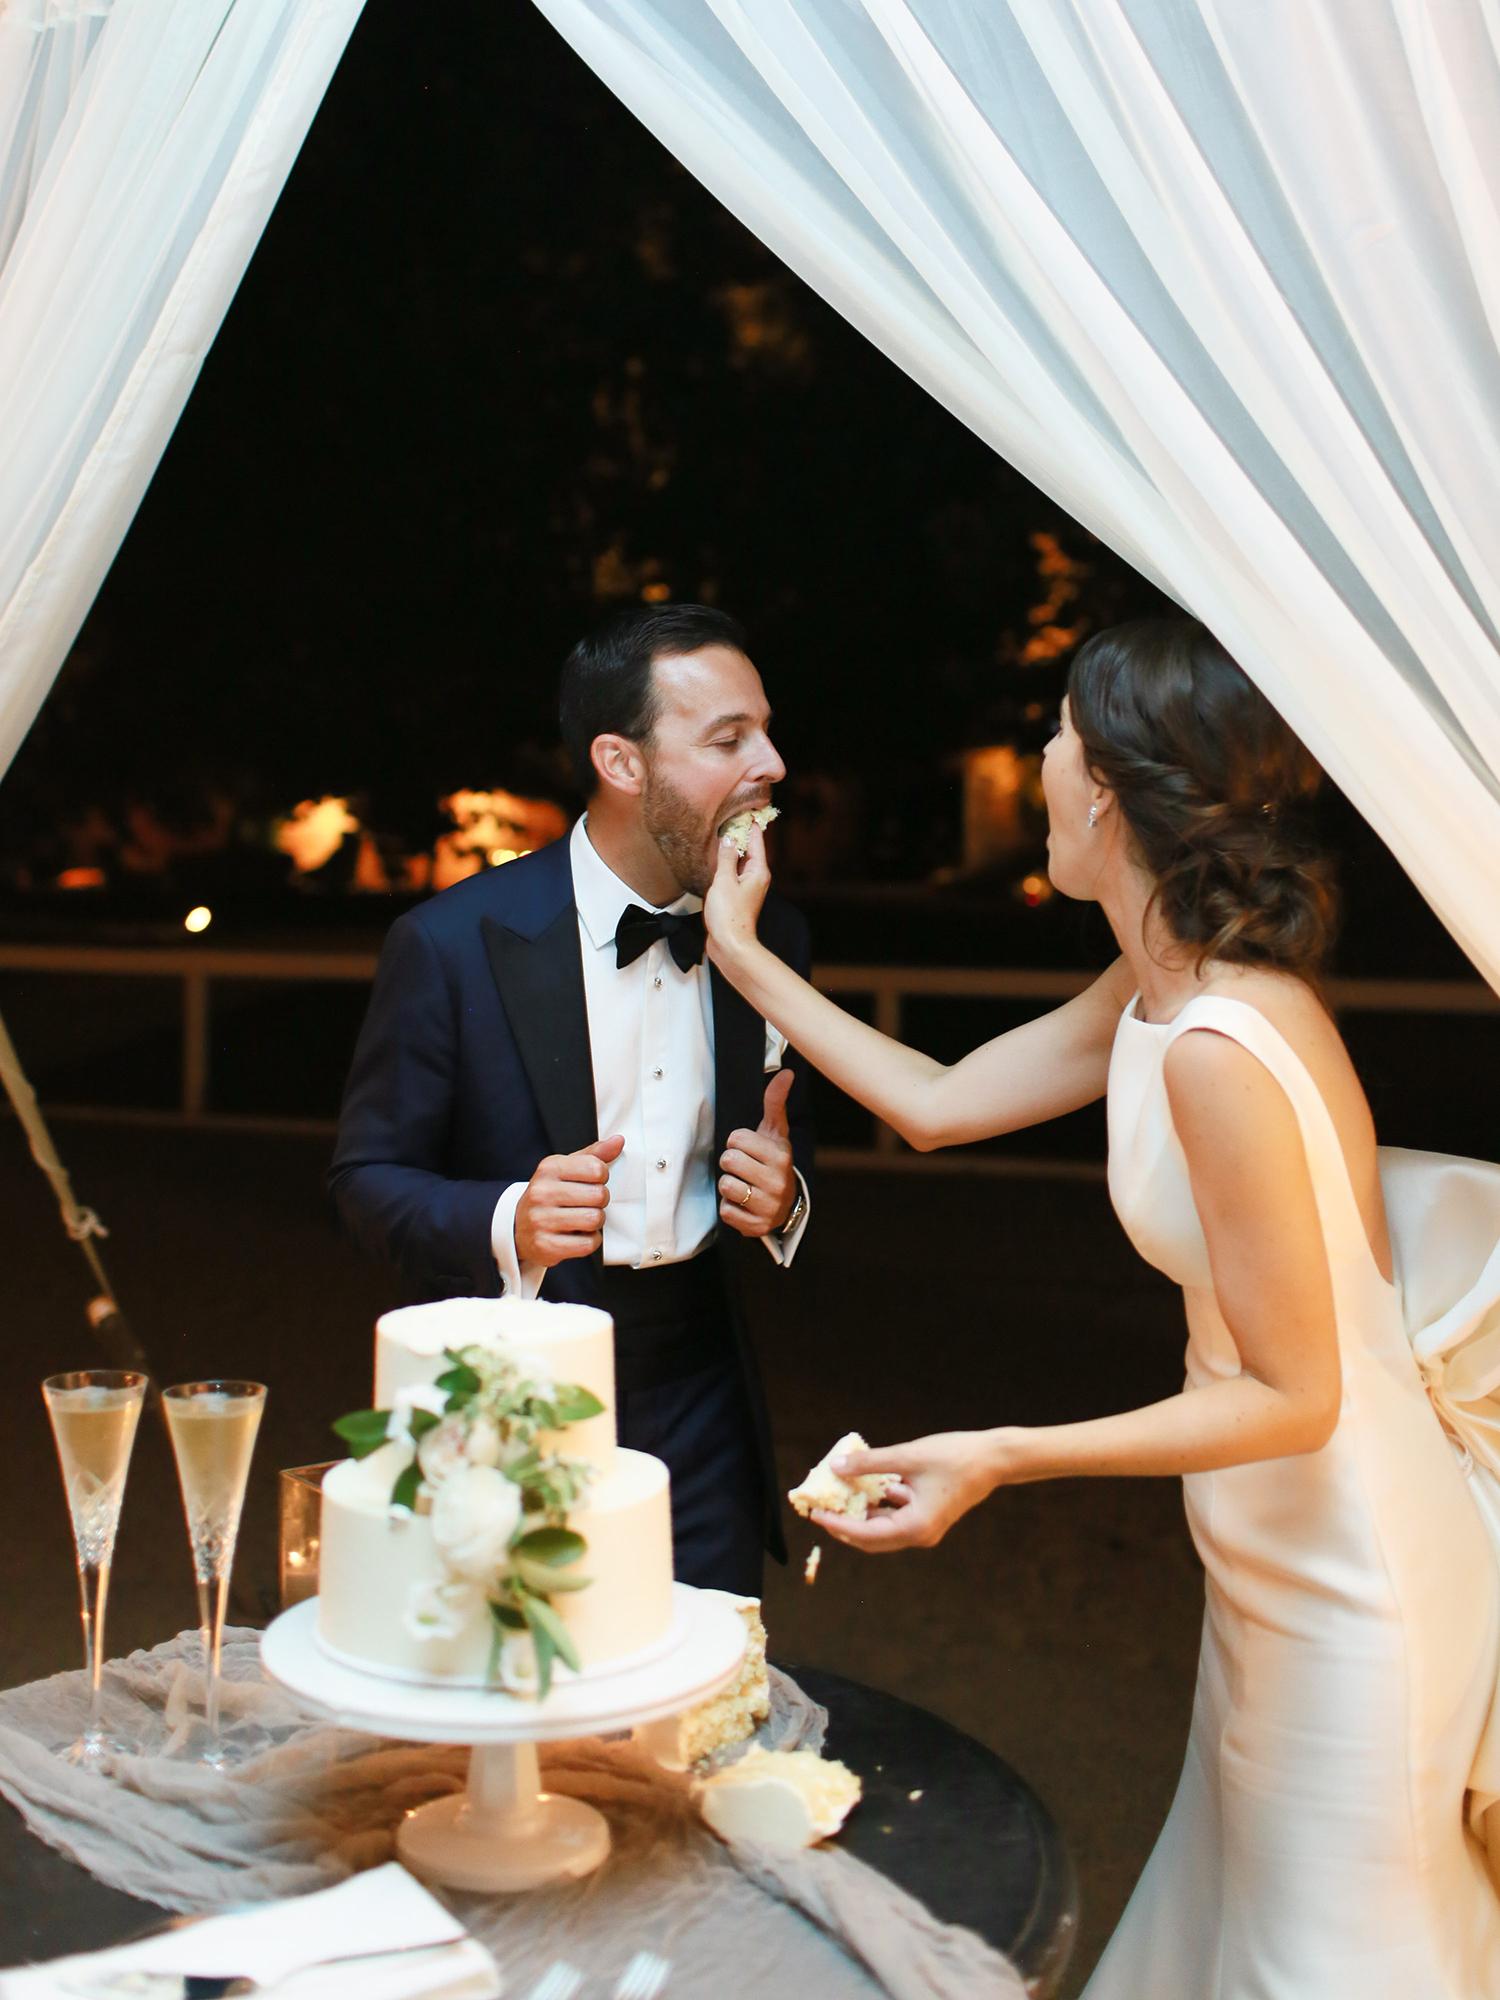 katie mike wedding cake smash bride and groom